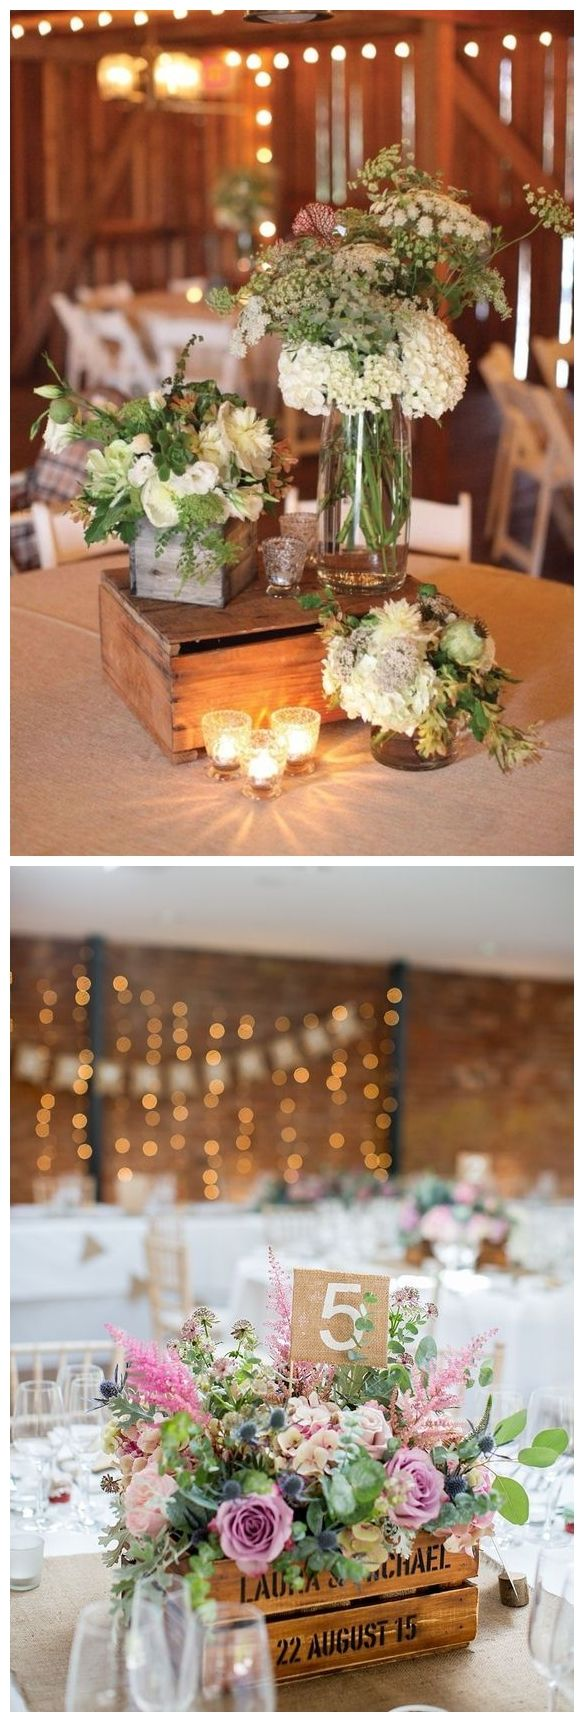 Rustic Woodsy Wedding Trend 2018 Wooden Crates Wedding